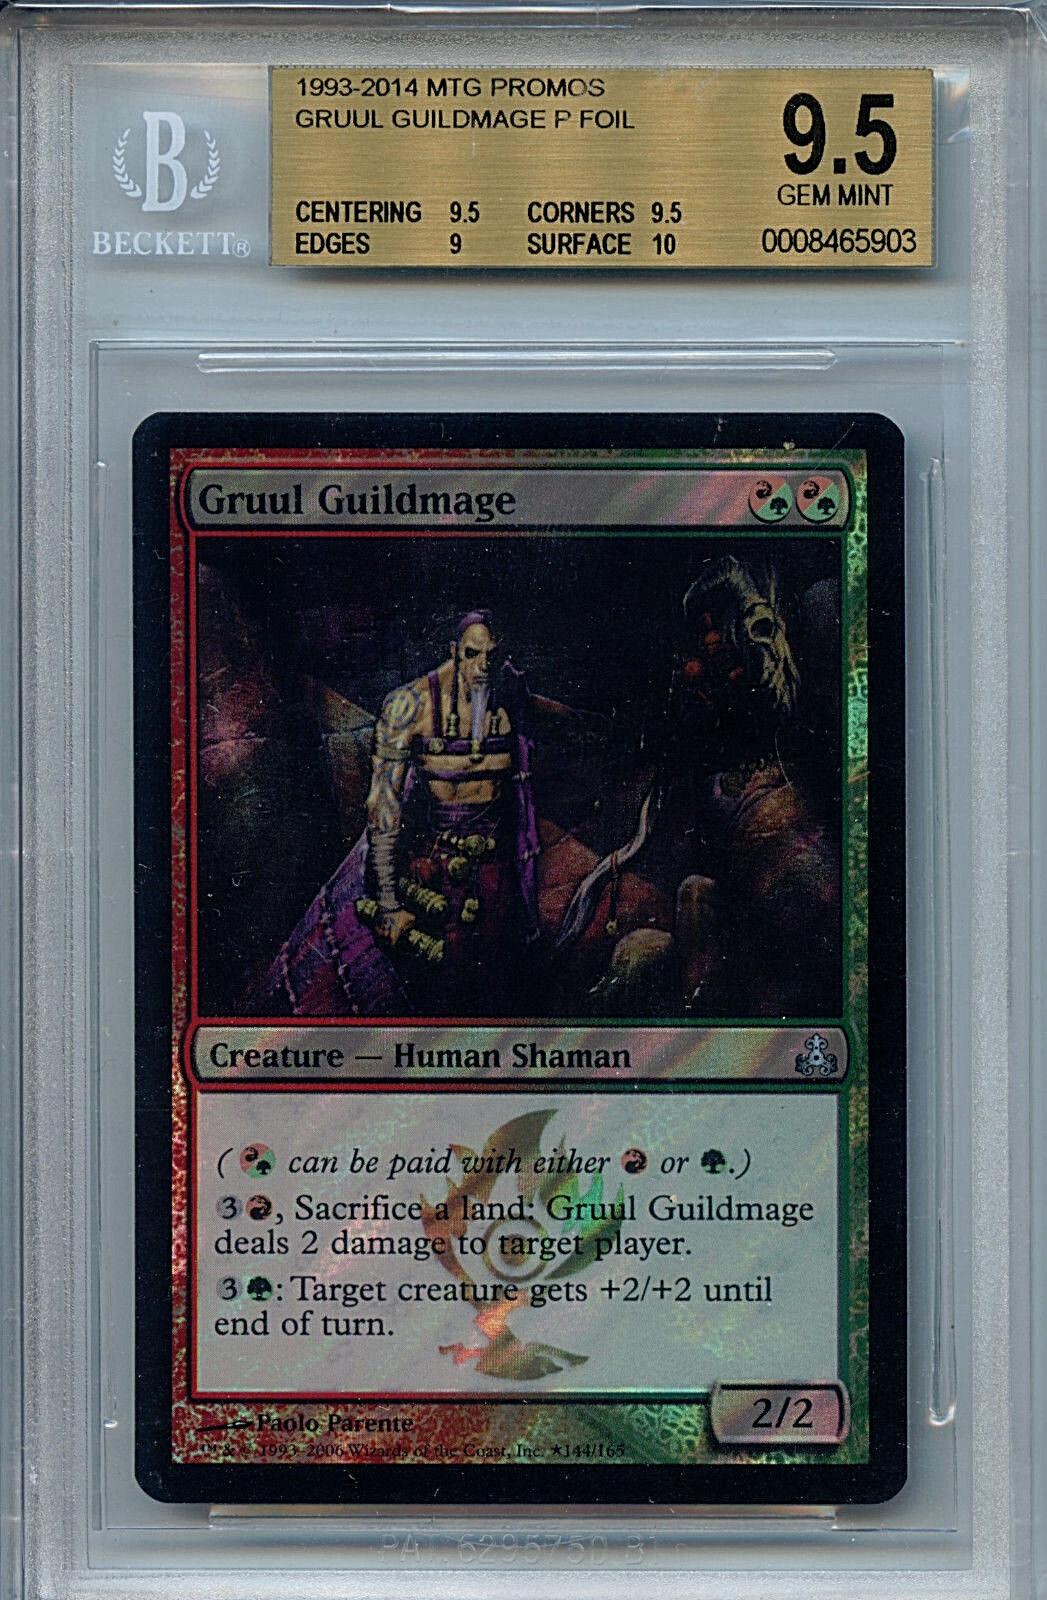 MTG Gruul Guildmage BGS 9.5 Gem Gem Gem Mint MTG Foil Promos 5903 Amricons 1d5a72